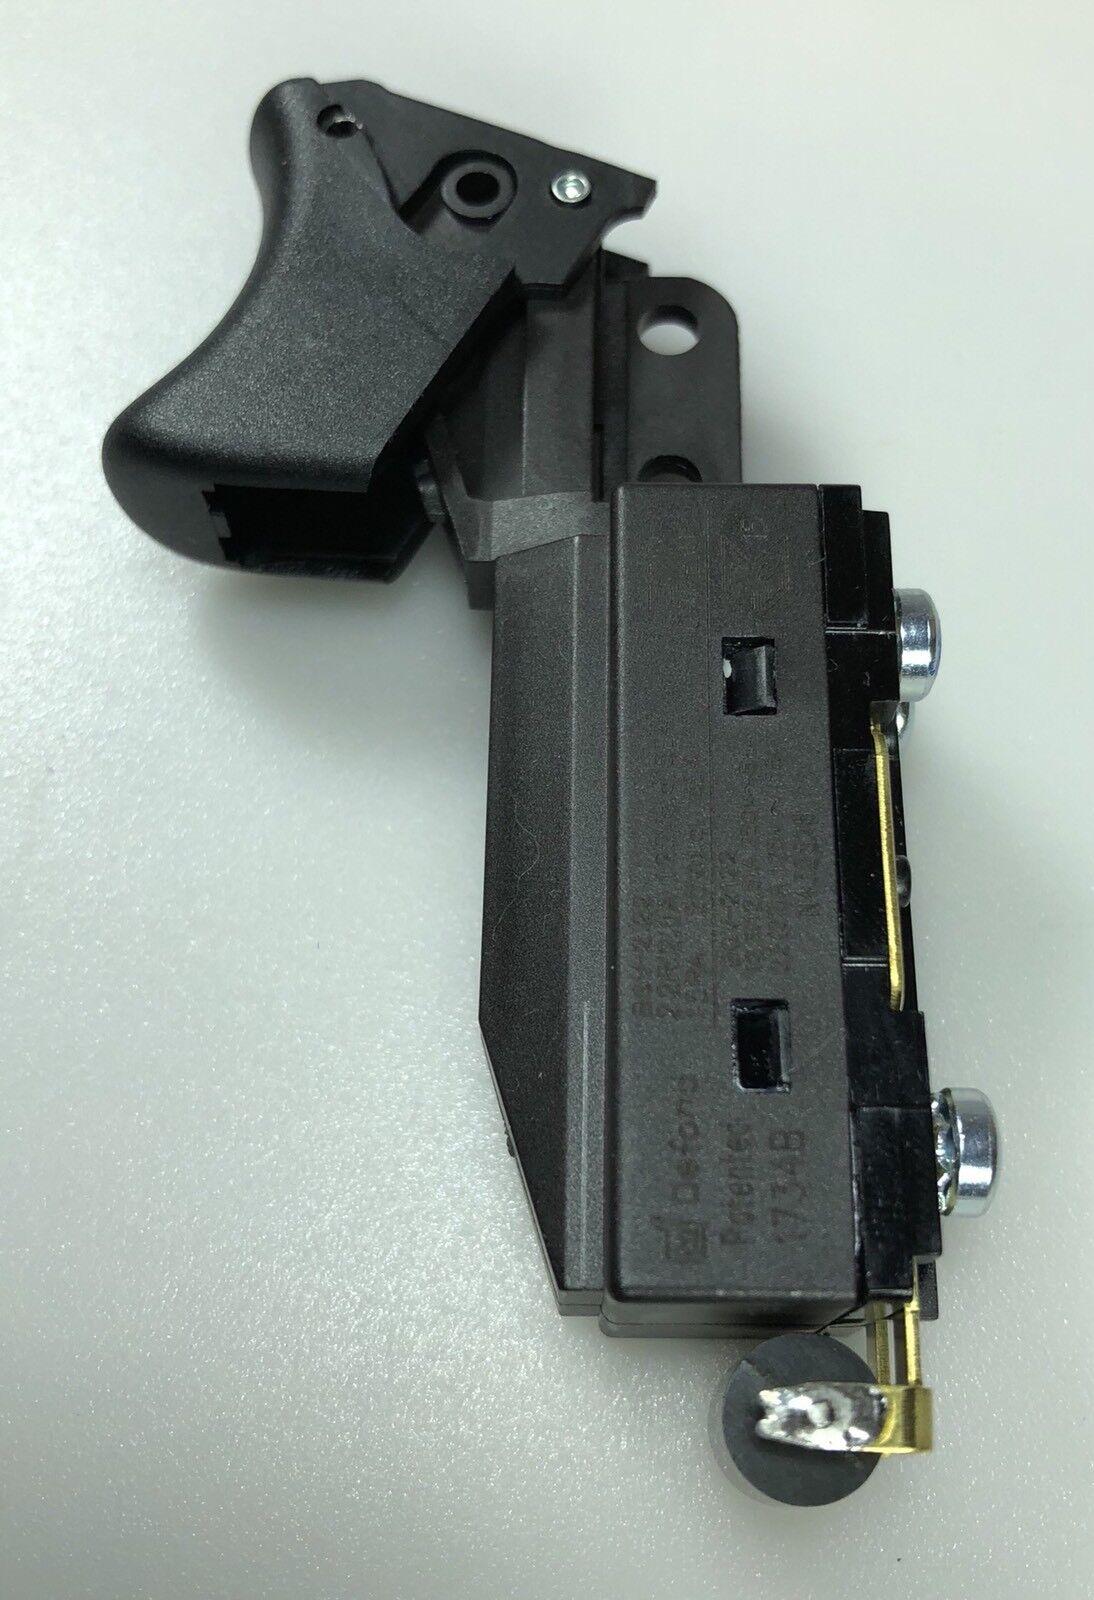 Piezas Dewalt Dccs 620 20 V 12  Interruptor de la motosierra